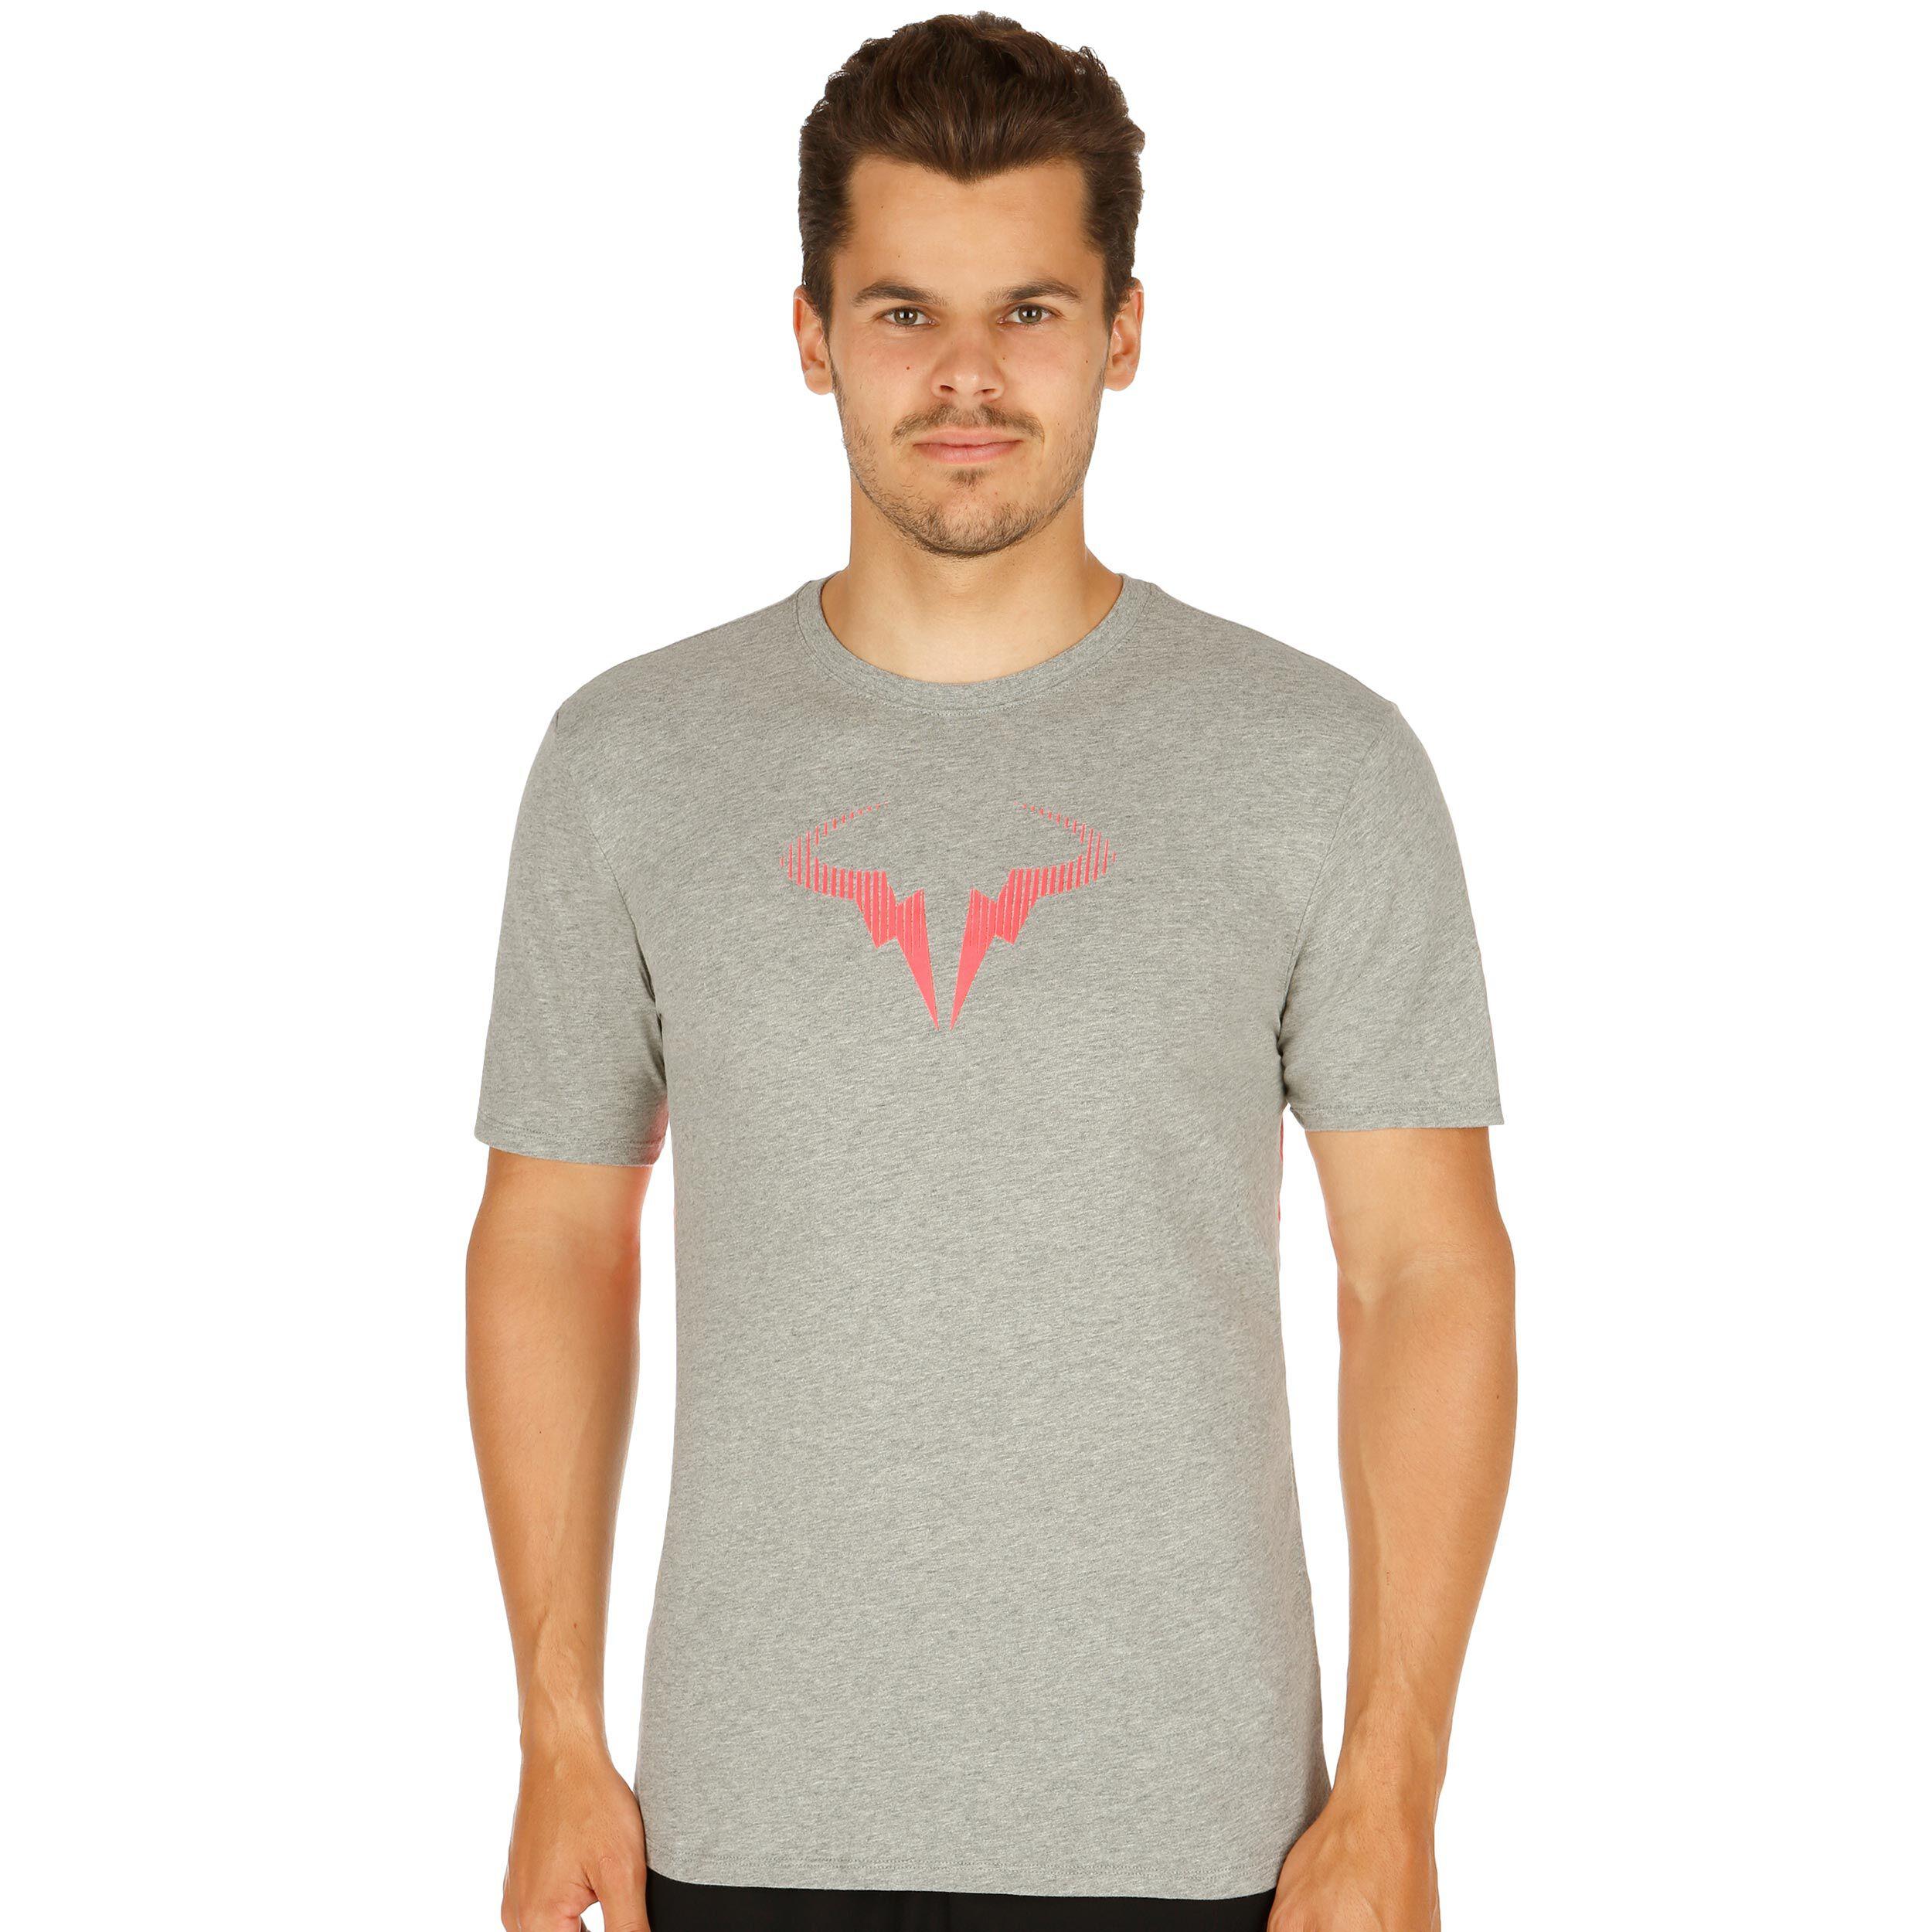 Dunlop T-SHIRT SPORT shirt grande girocollo grigio 85/% Cotone M-XXL